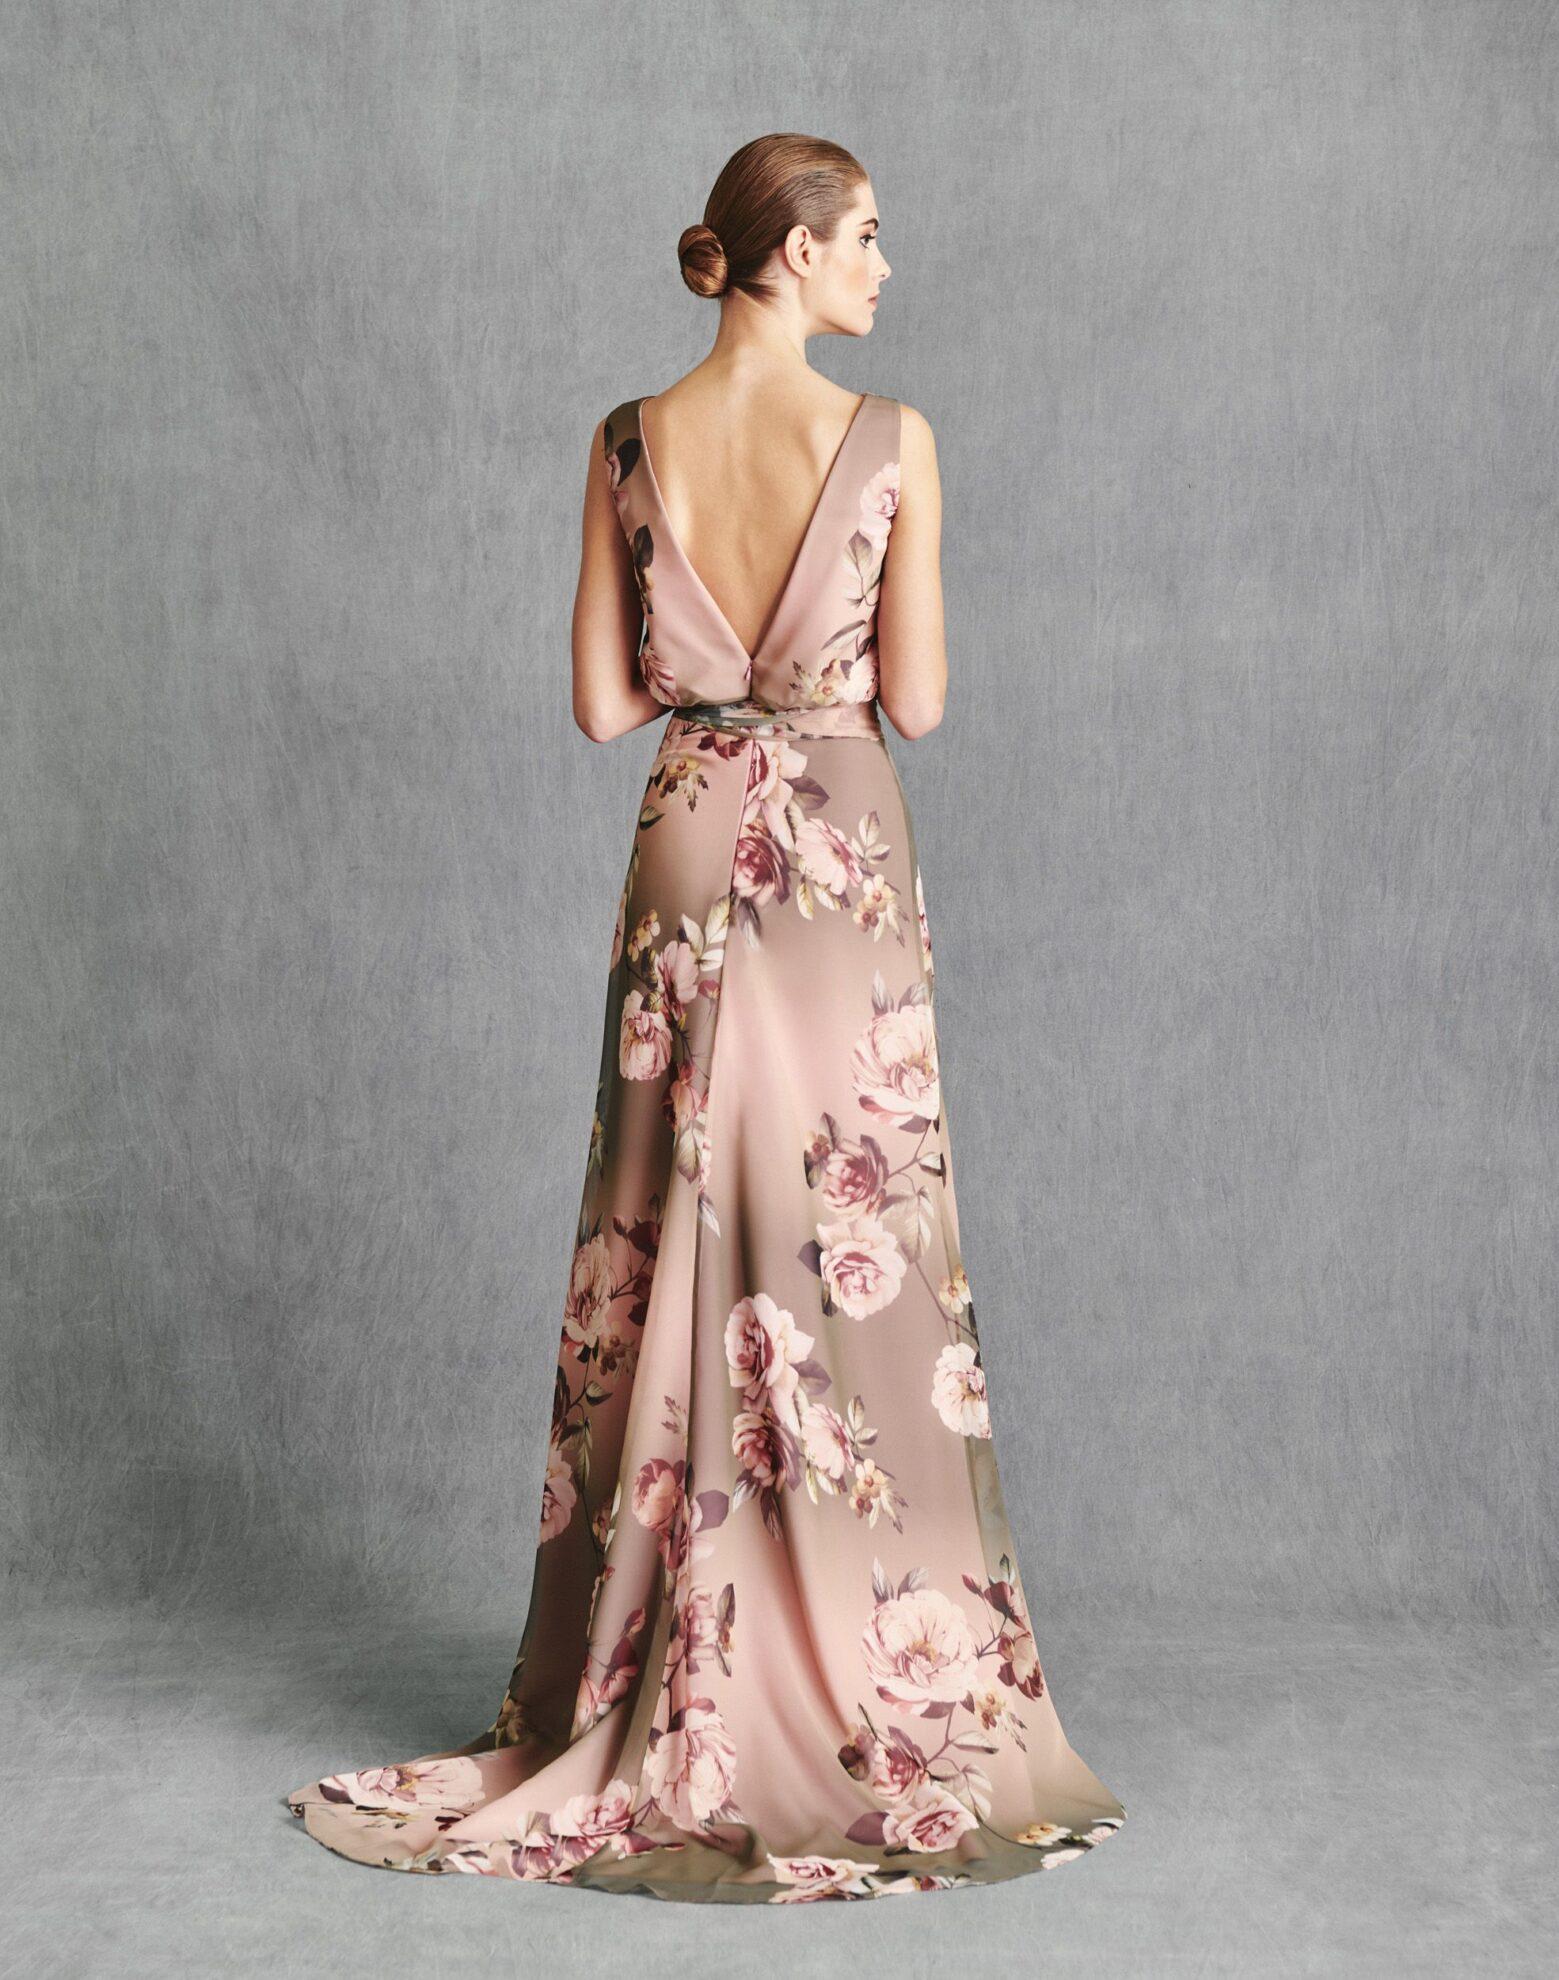 Vestidos de Fiesta 2020 - Silvia Fernandez Atelier - ISHTAR - detras